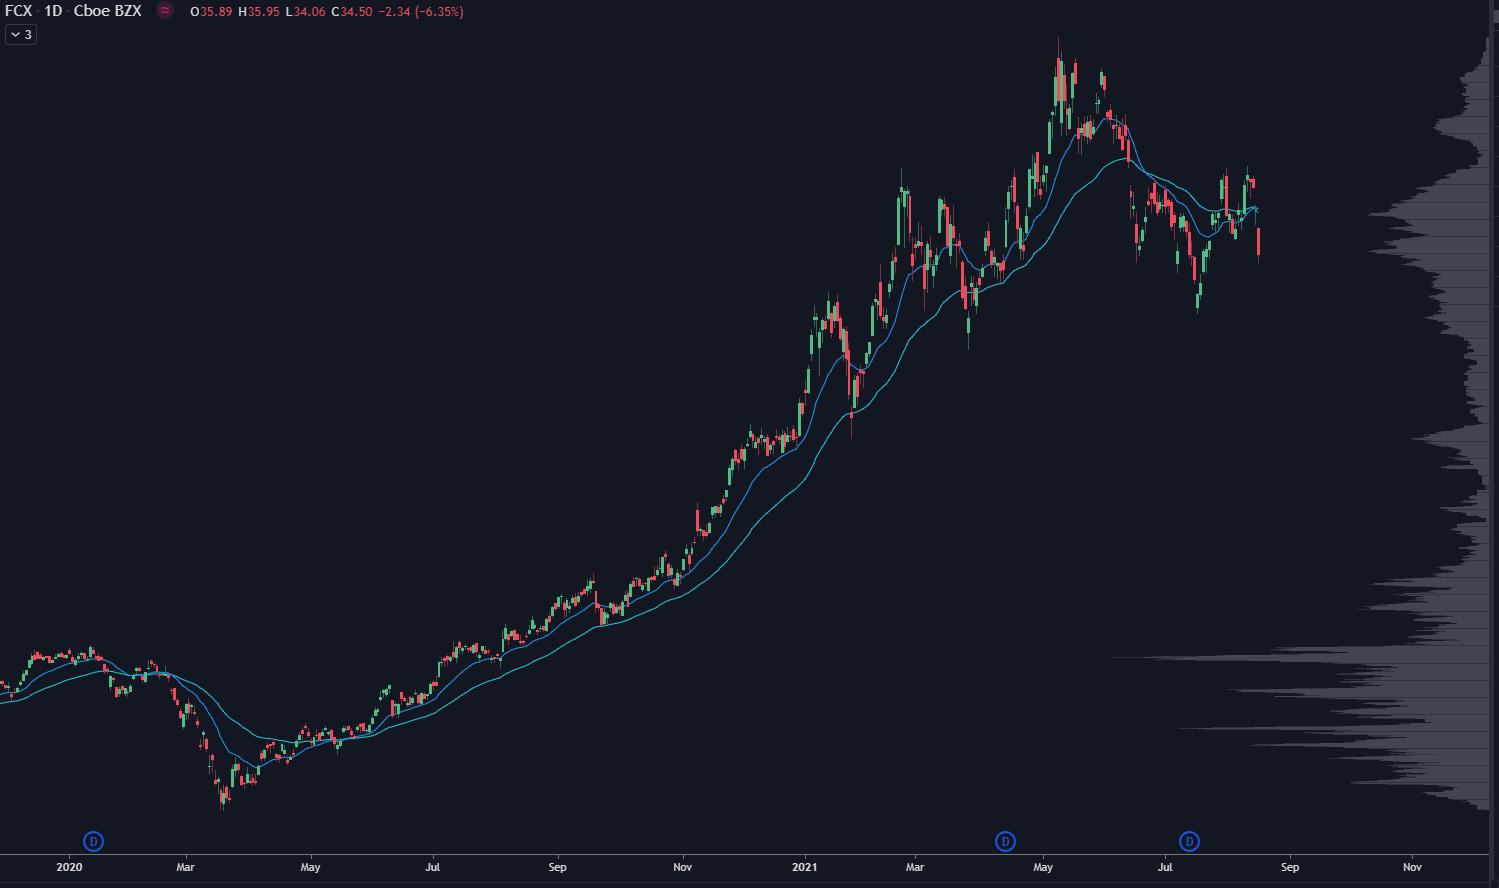 FCX Stock Chart Image